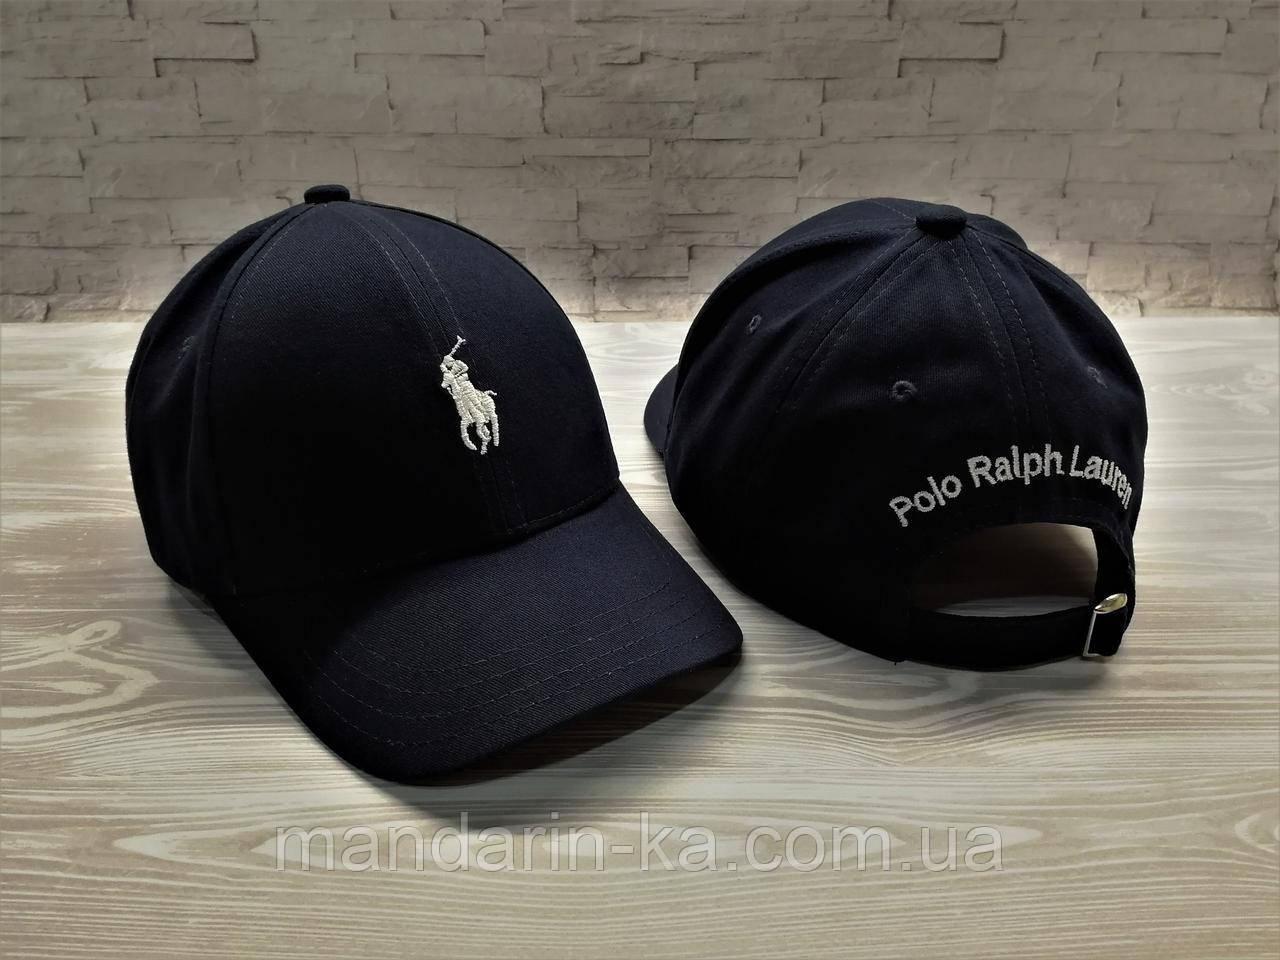 Кепка бейсболка блайзер Polo Ralph Lauren Ральф Лорен темно-синяя (реплика)